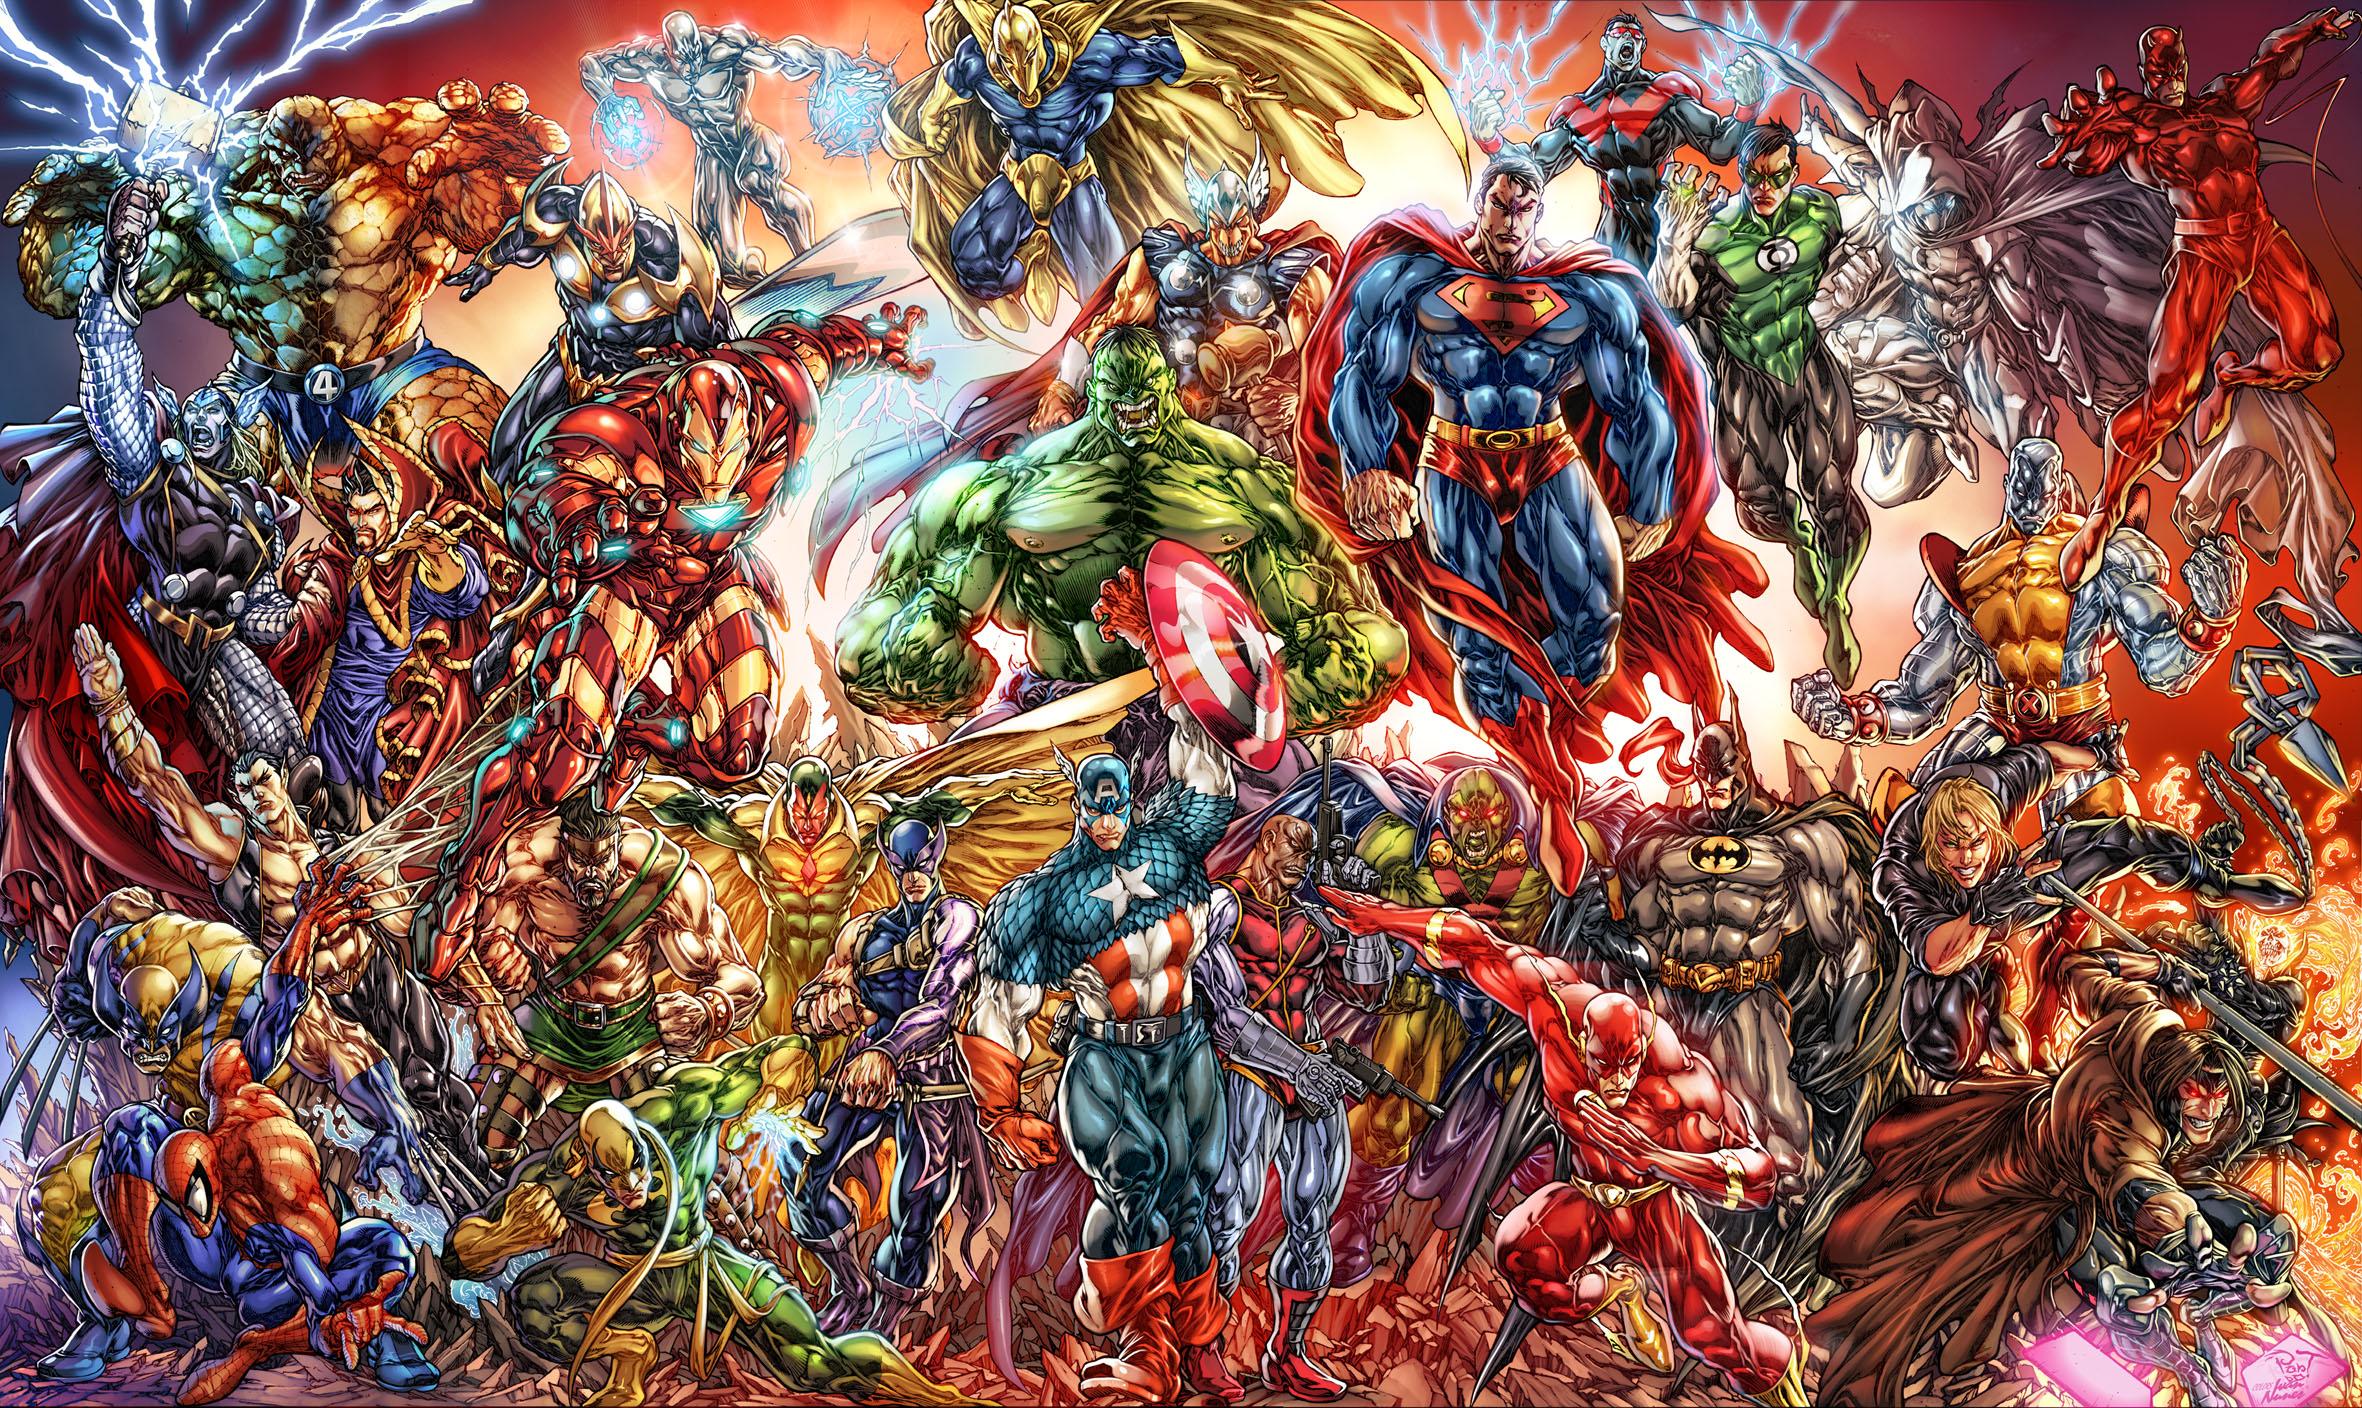 Green Lantern Nightwing Flash Moon Knight DC Comics Wallpaper 2362x1408